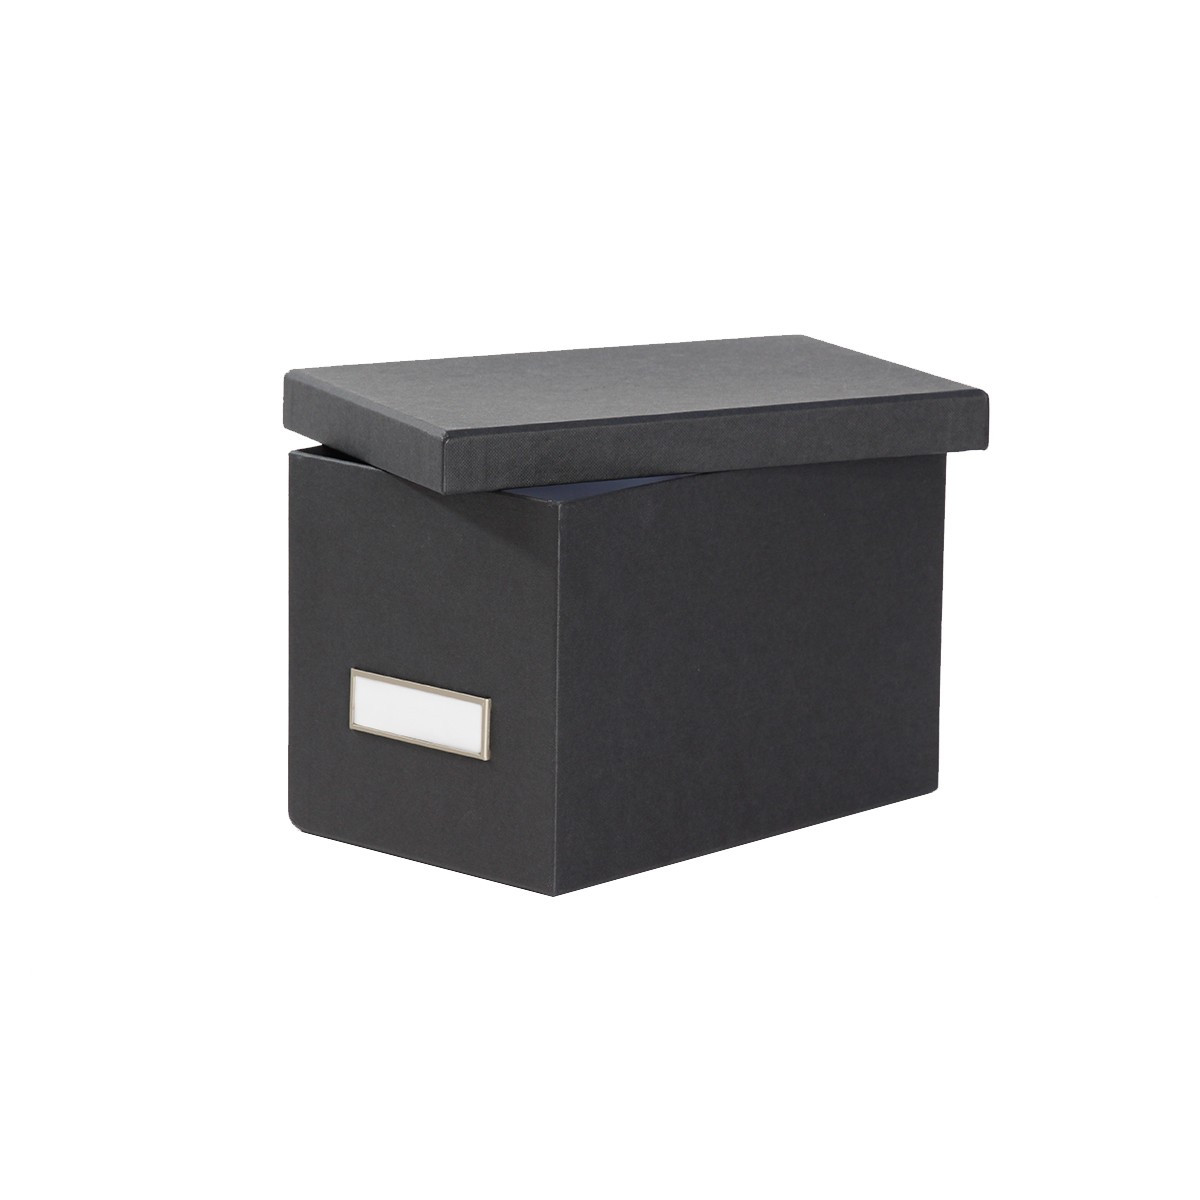 bo te de rangement cd en carton gris fonc. Black Bedroom Furniture Sets. Home Design Ideas